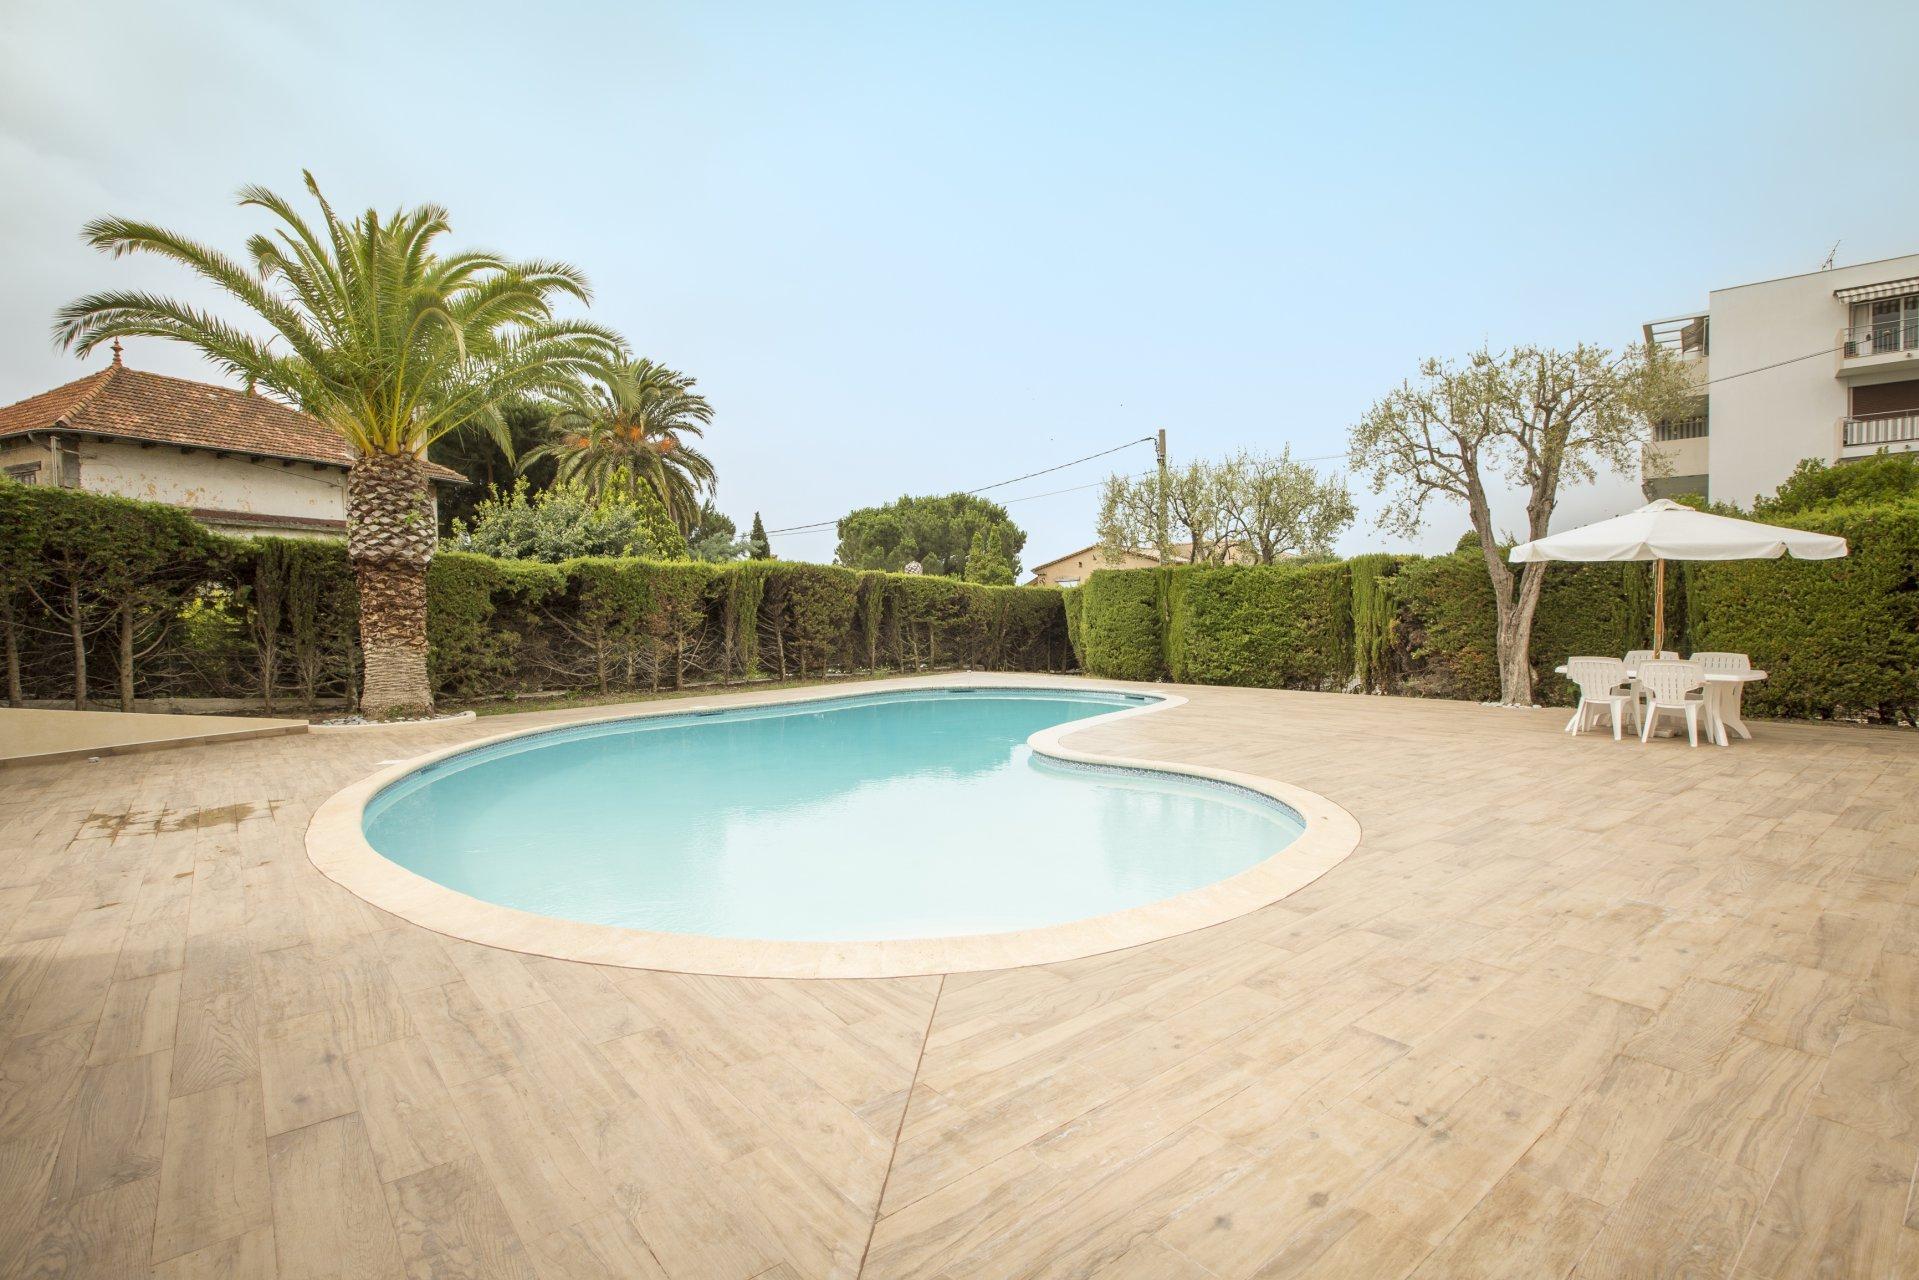 Cannes Croix des Gardes - Sunny studio garden apartment 34.83m² Crox des Gardes